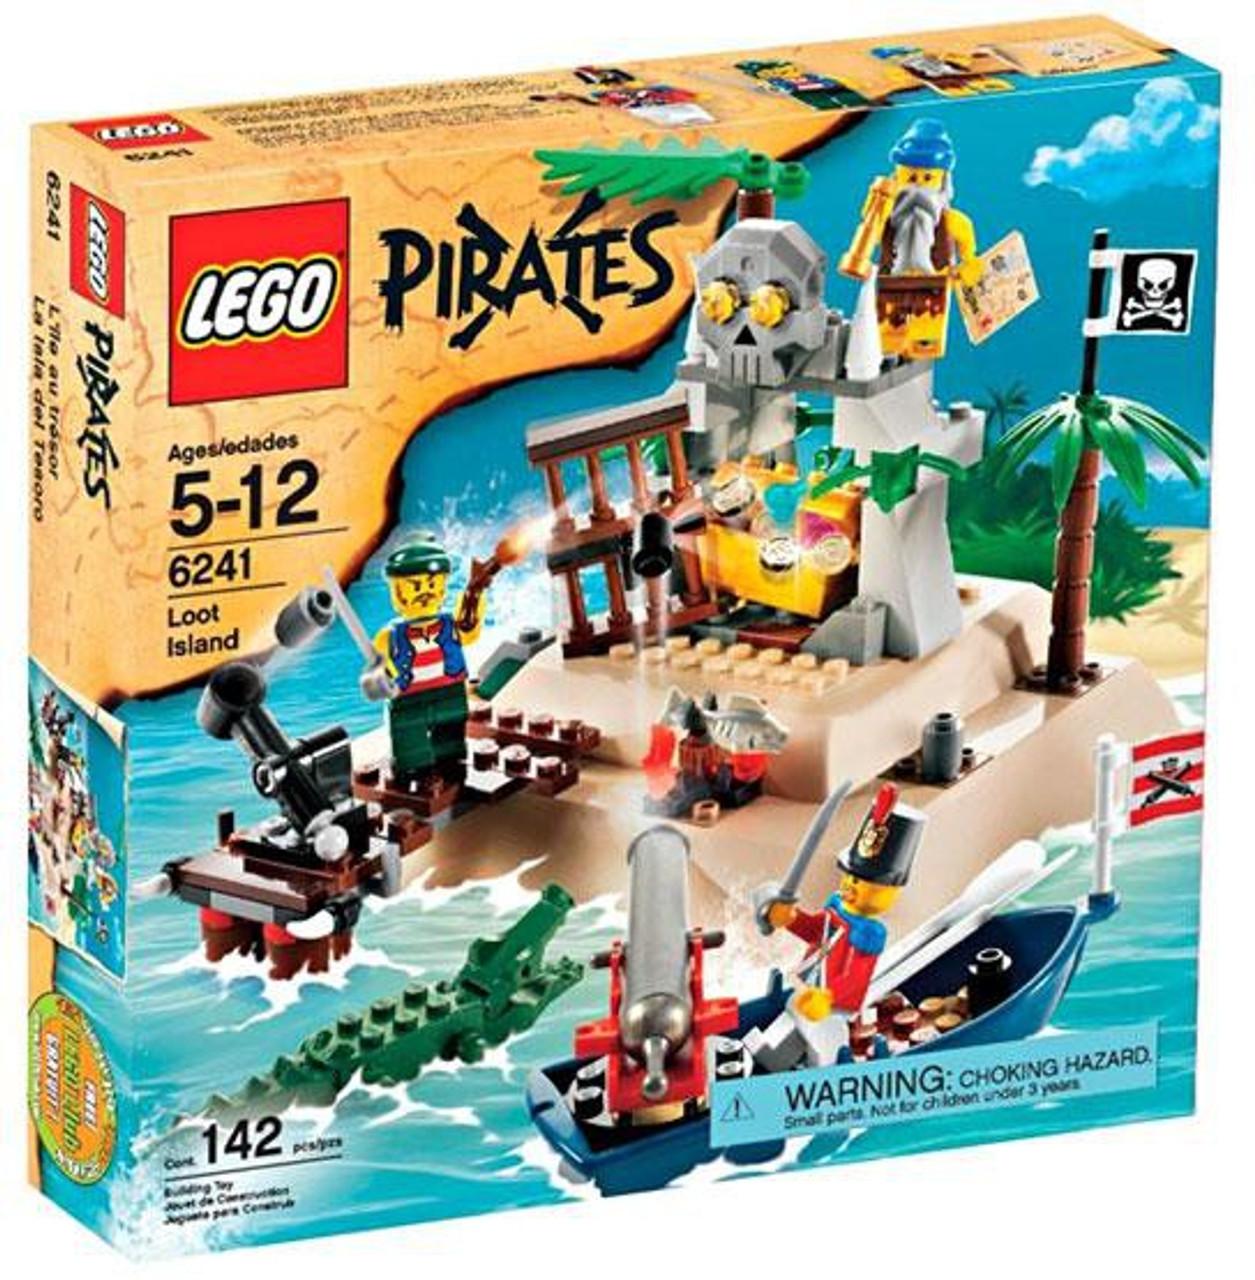 LEGO Pirates Loot Island Set #6241